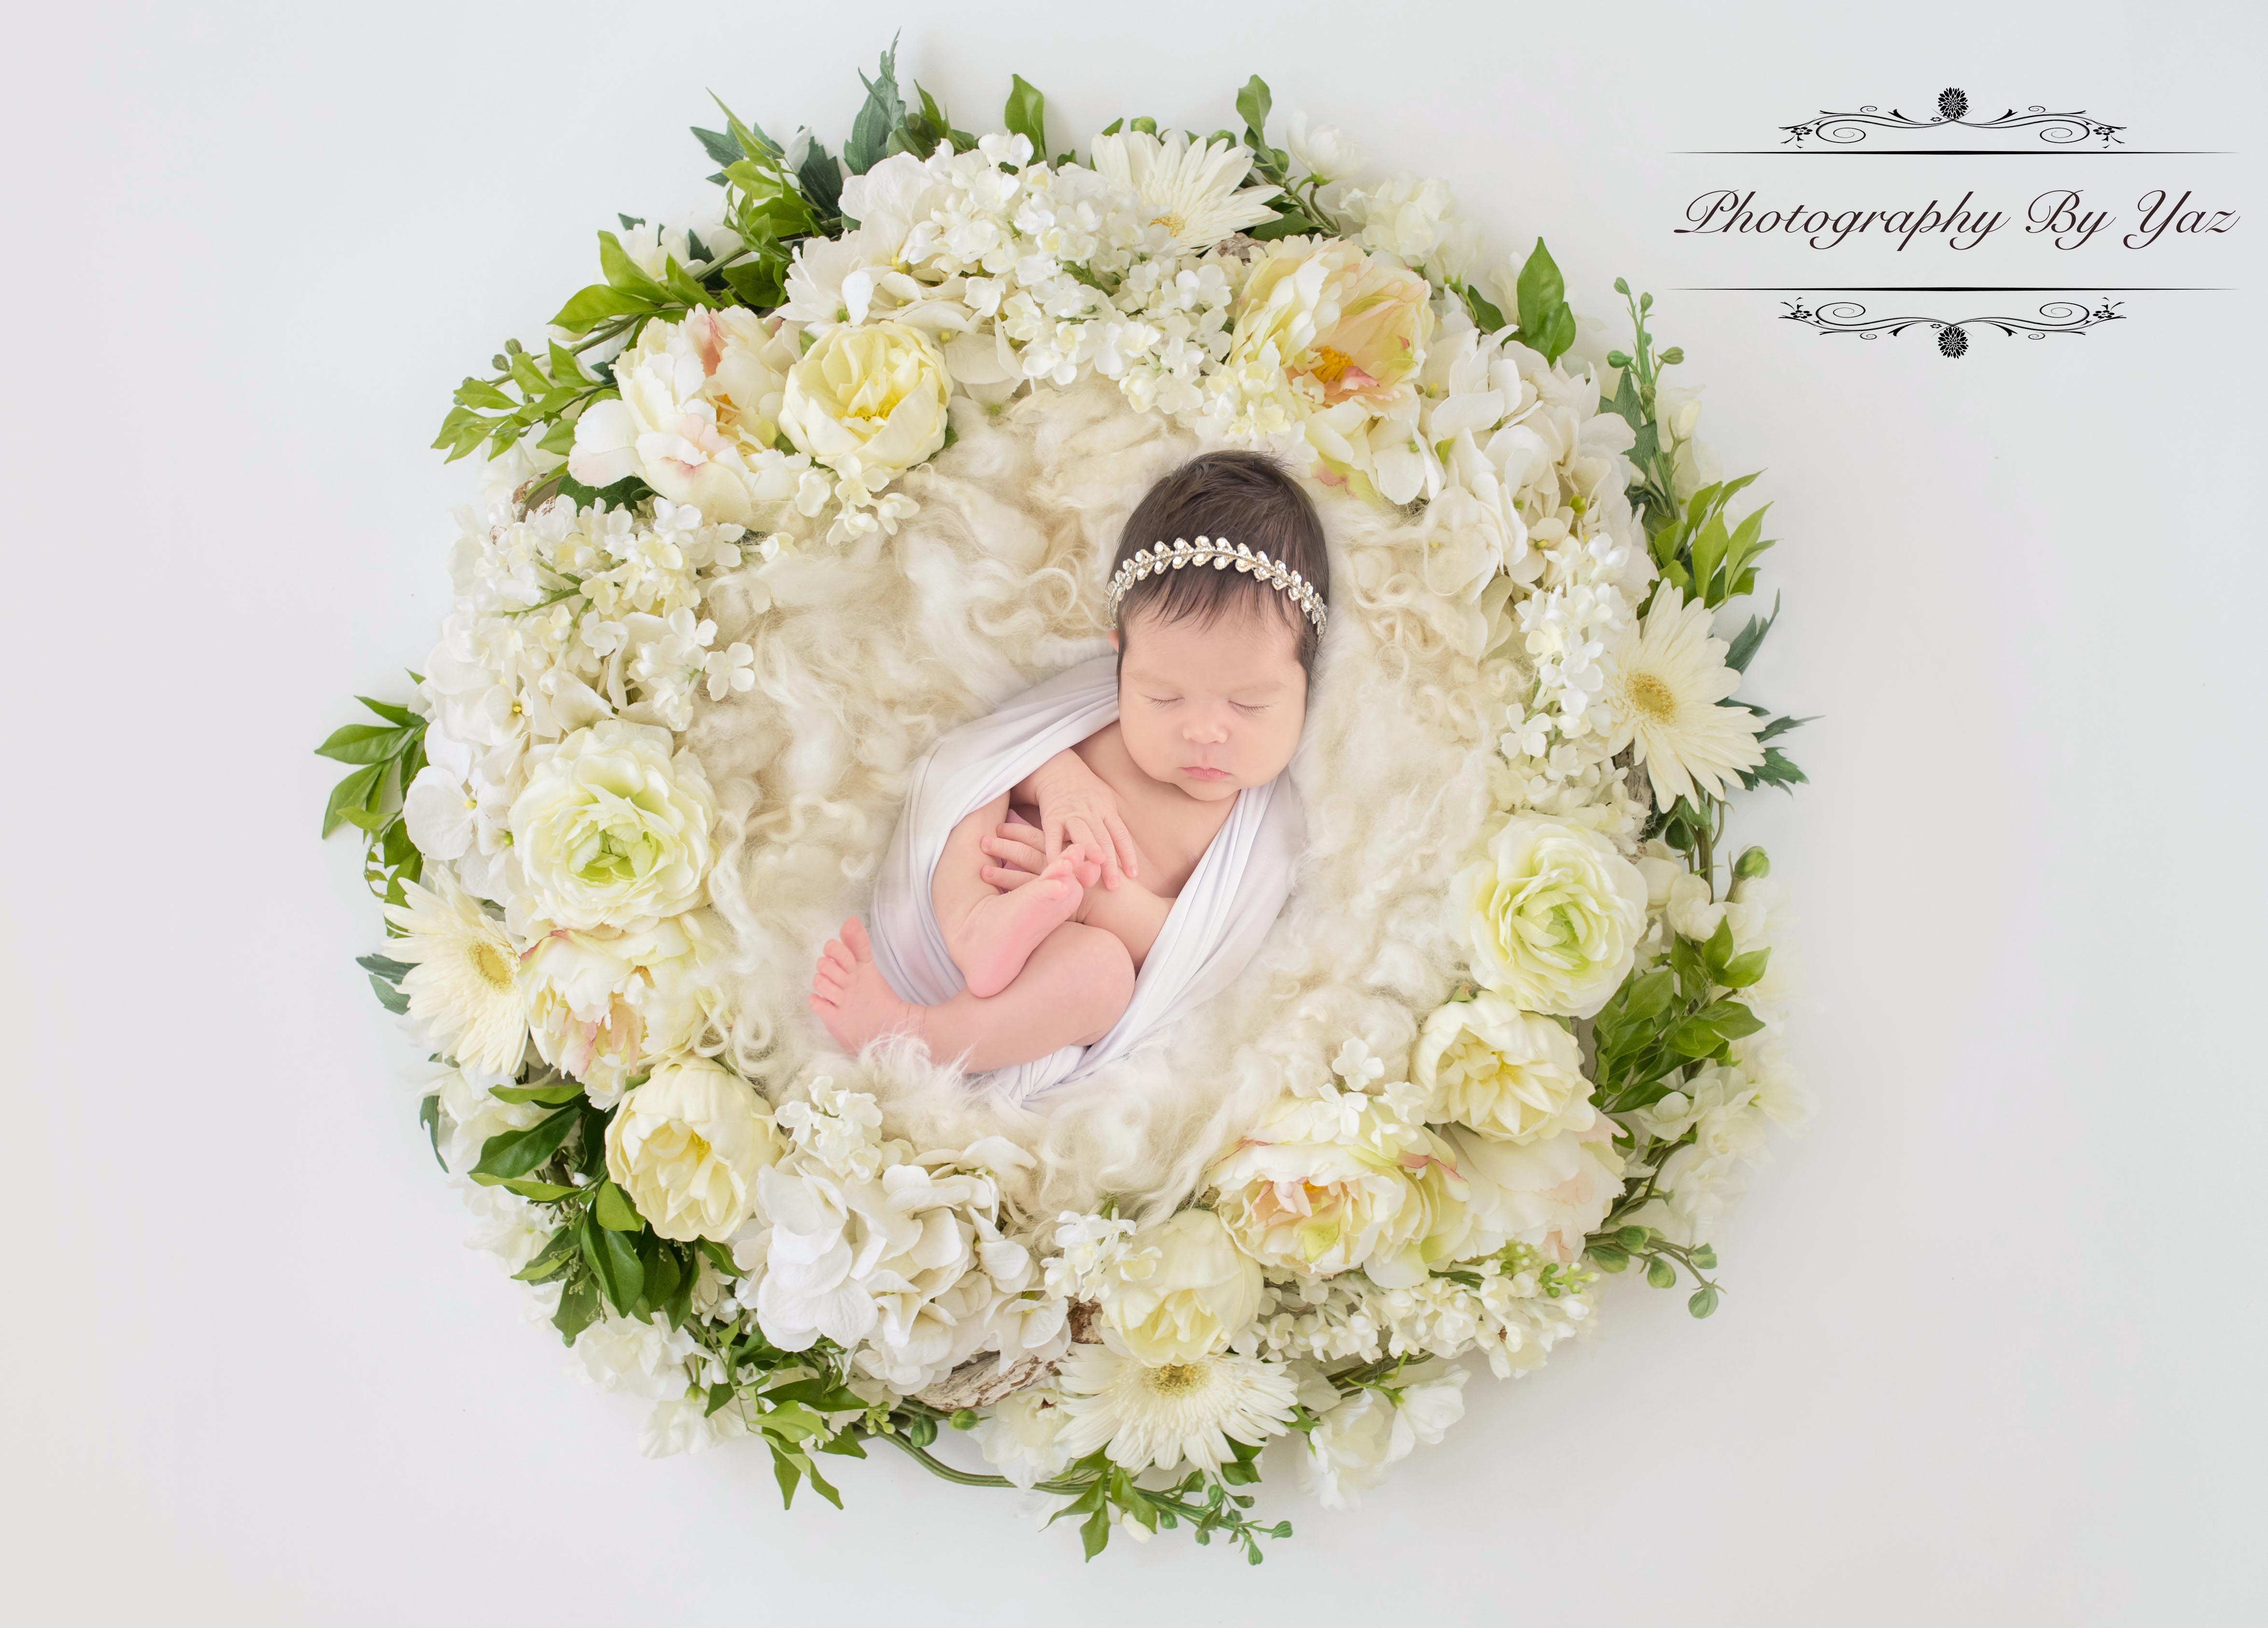 Flower ring newborn pictures